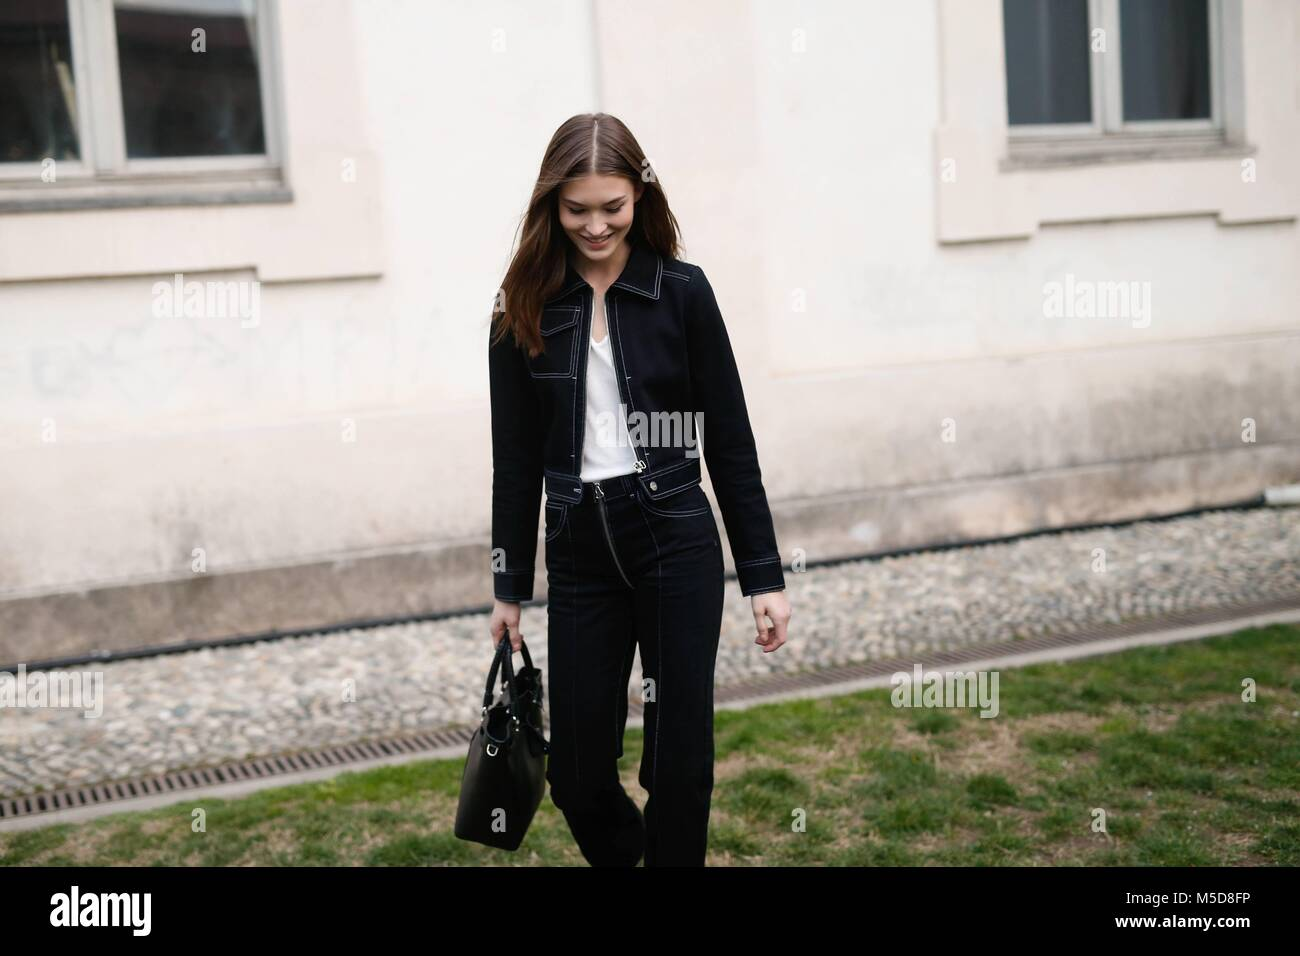 581f9049ef9e Model Grace Elizabeth attending the Alberta Ferretti show during Milan  Fashion Week - Feb 21